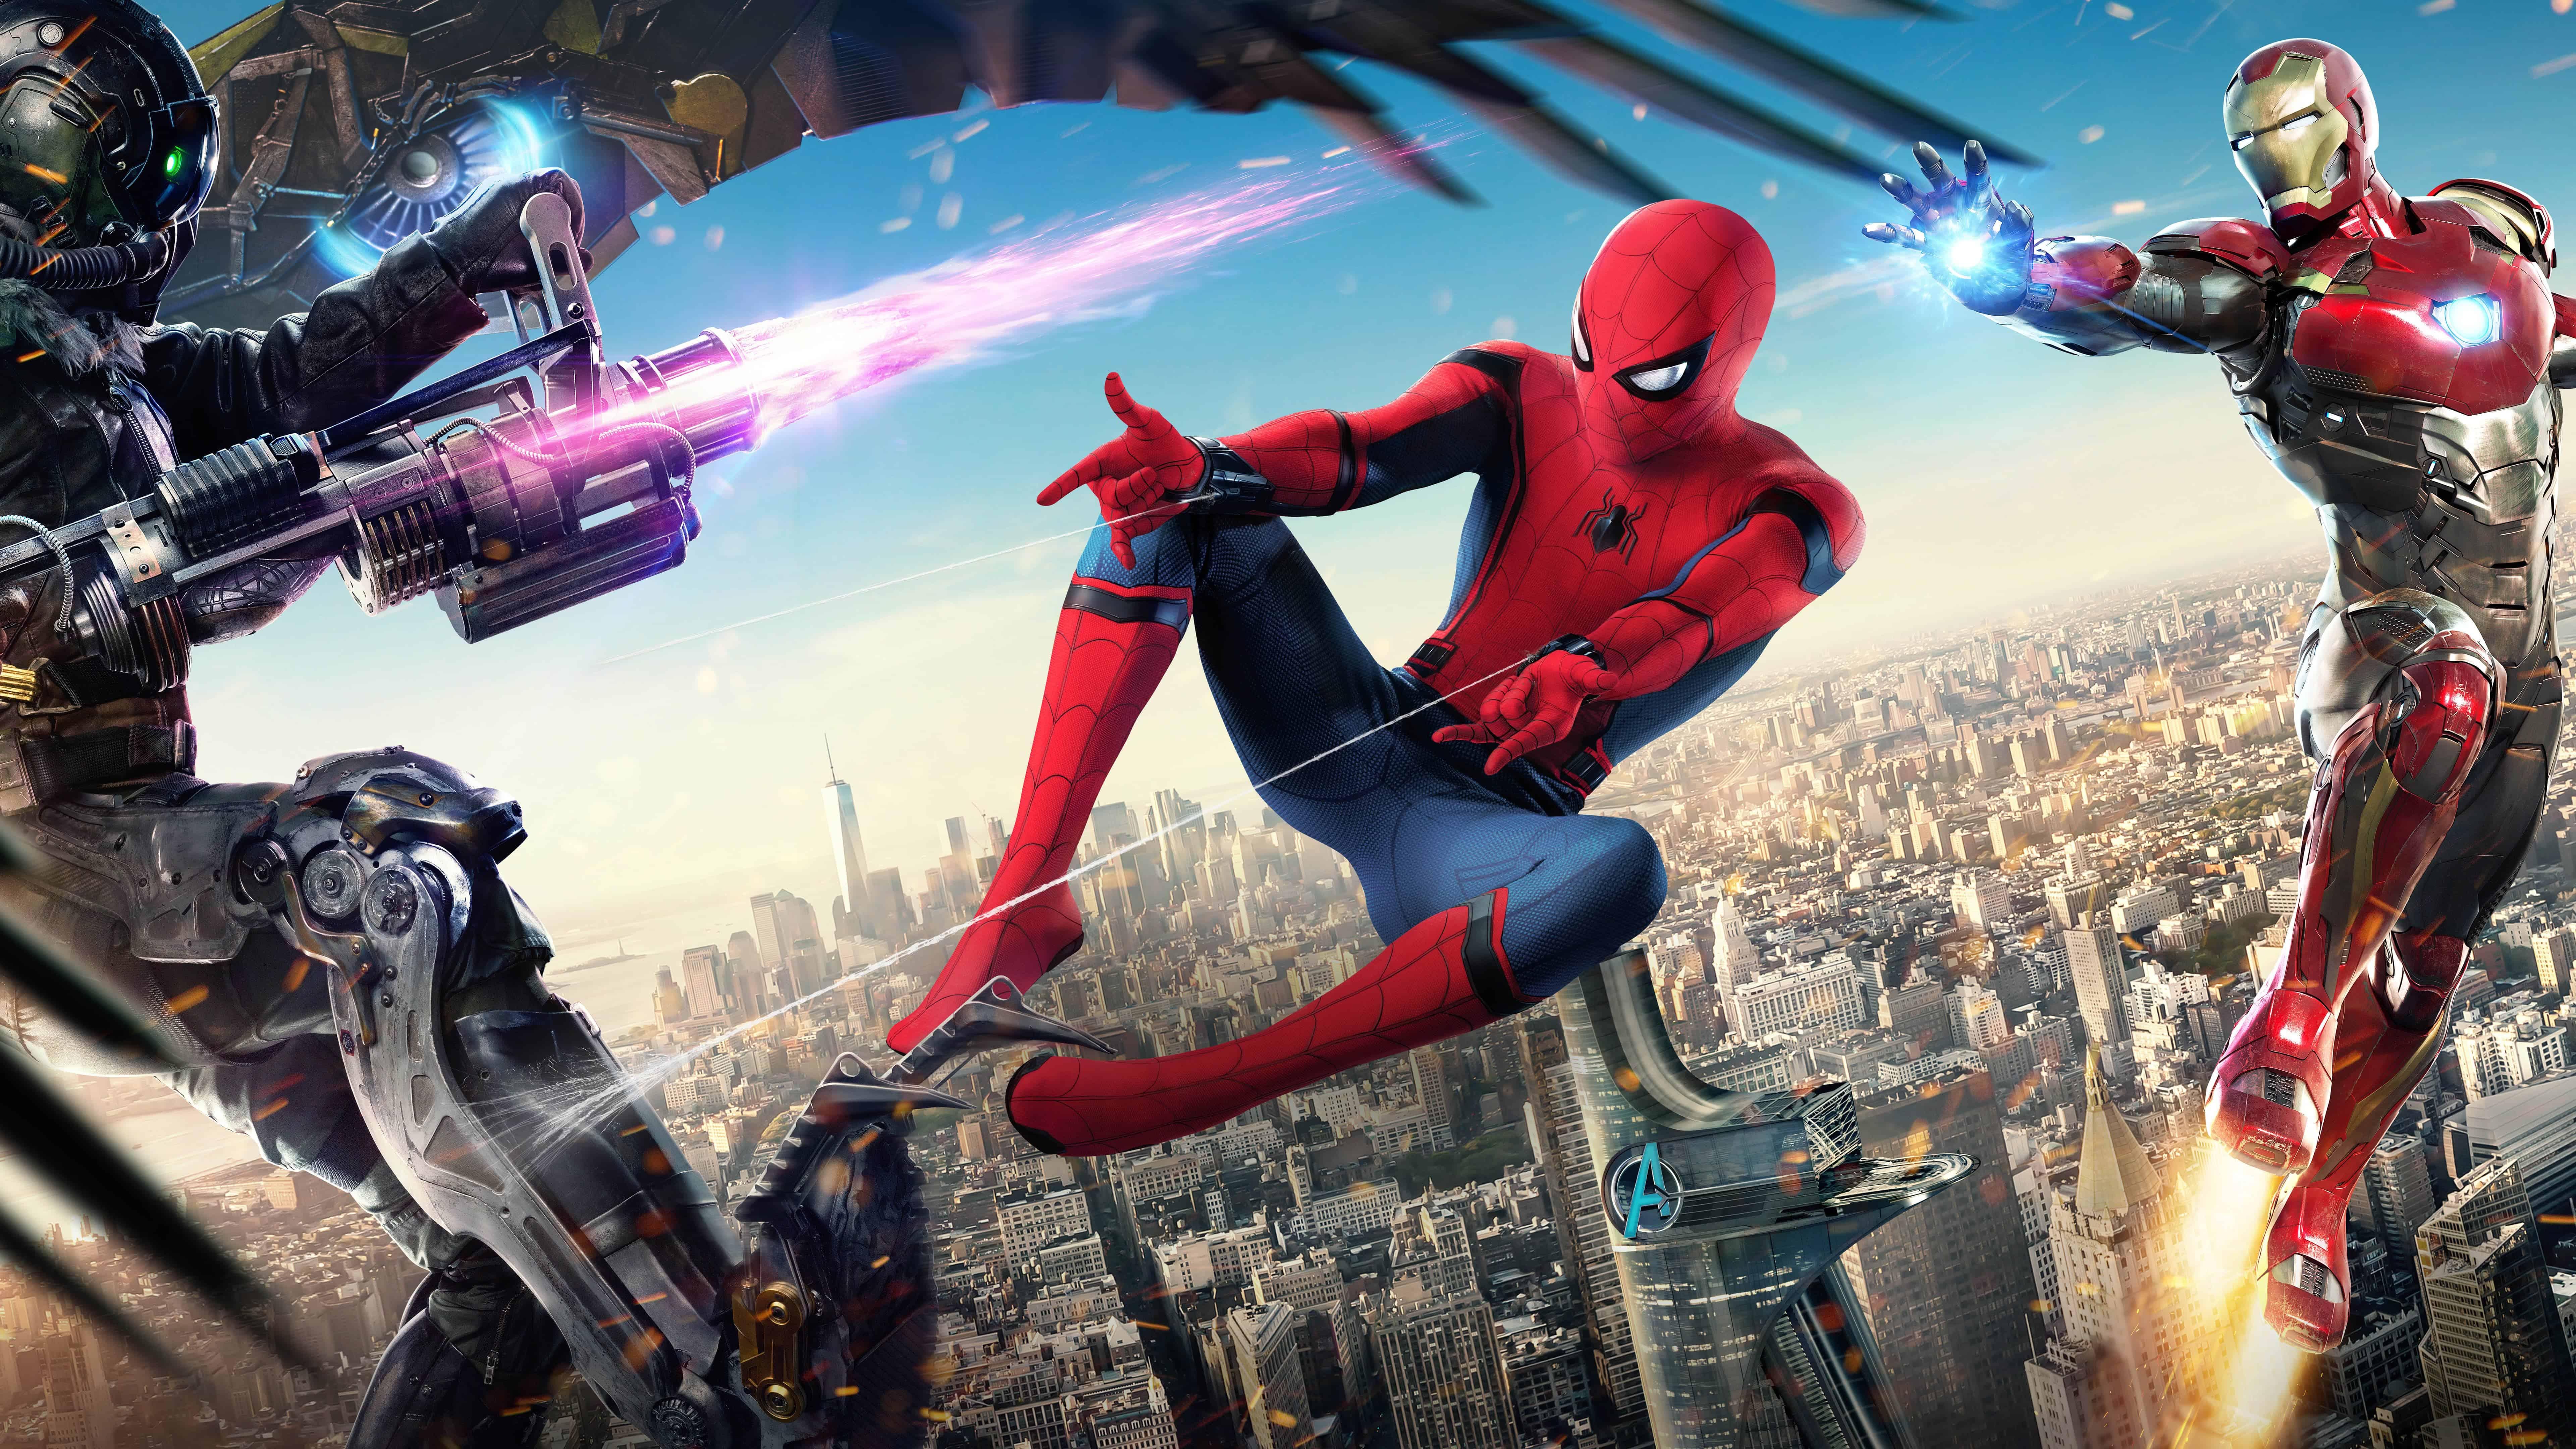 Spider Man Homecoming UHD 8K Wallpaper Pixelz 7680x4320